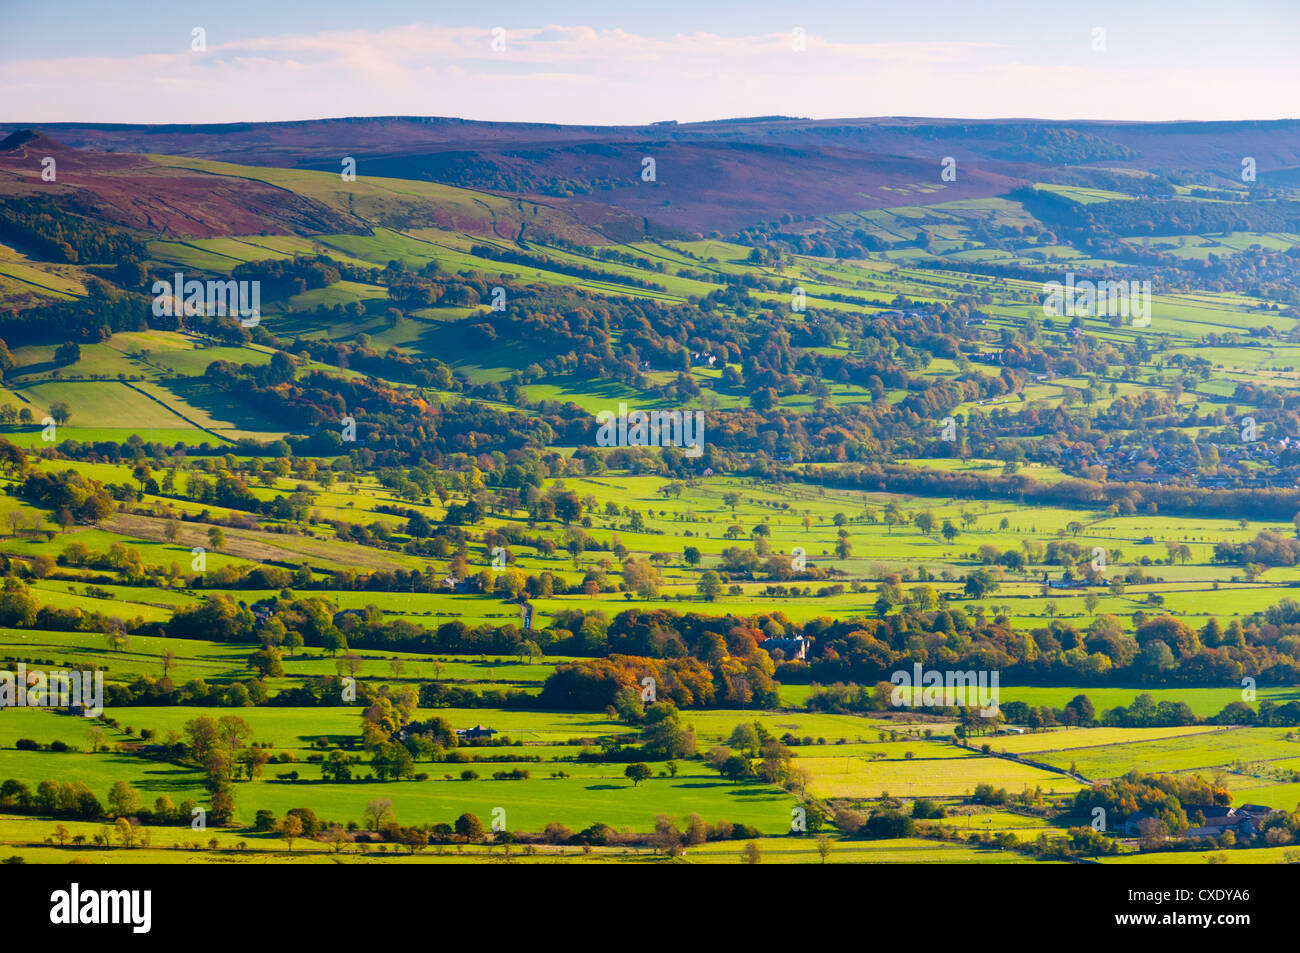 Hope Valley, Peak District National Park, Derbyshire, England - Stock Image